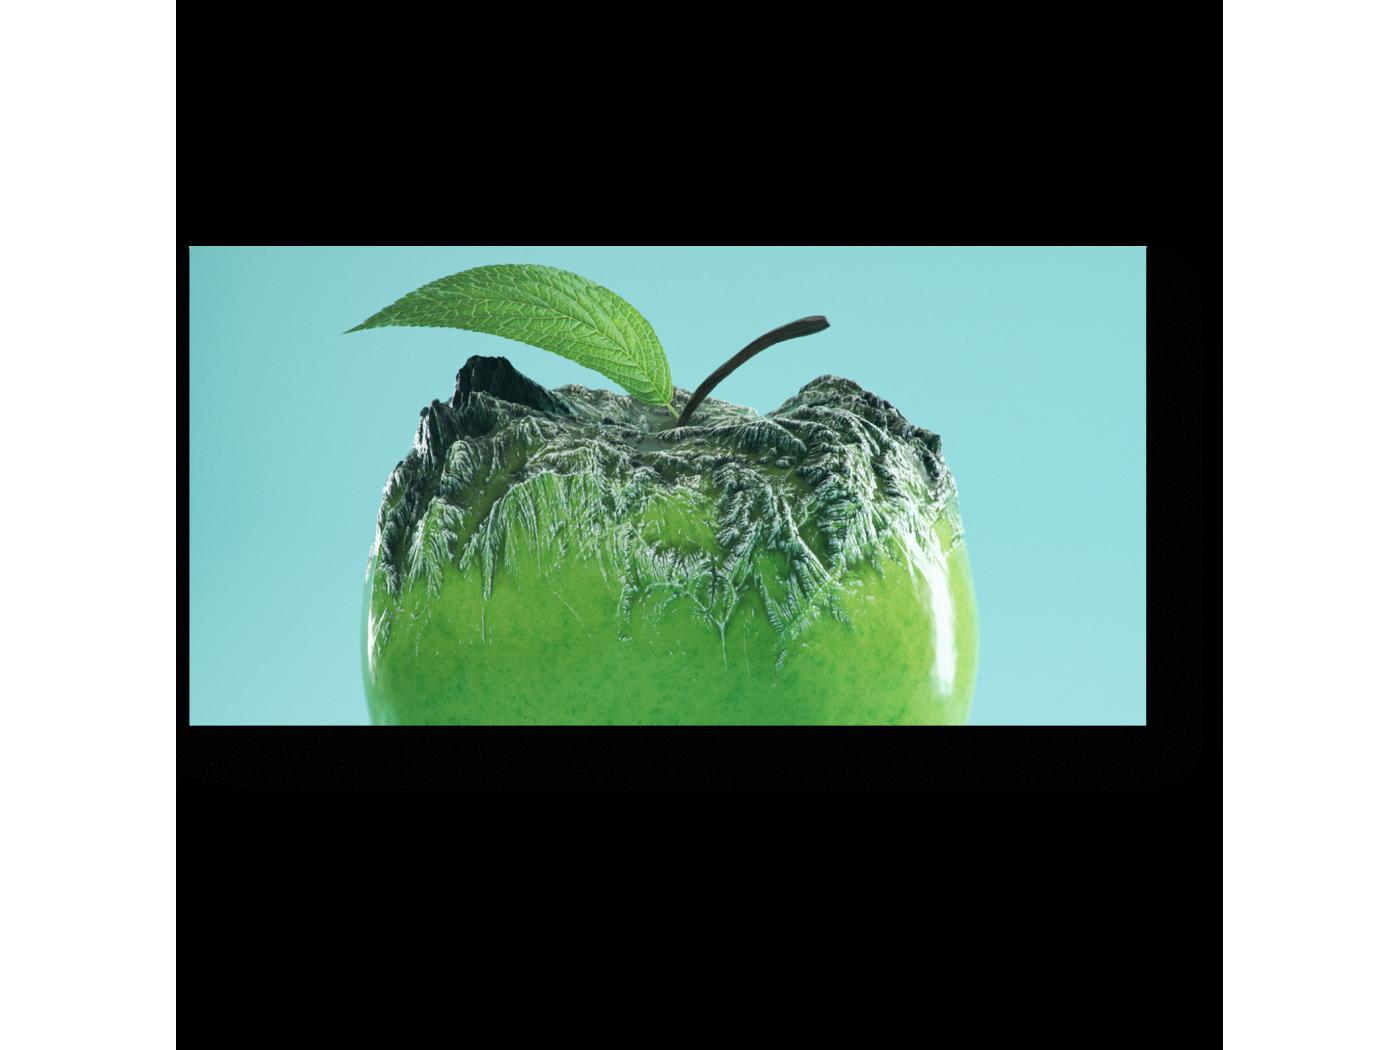 Модульная картина Заледеневшее яблоко (40x20) фото